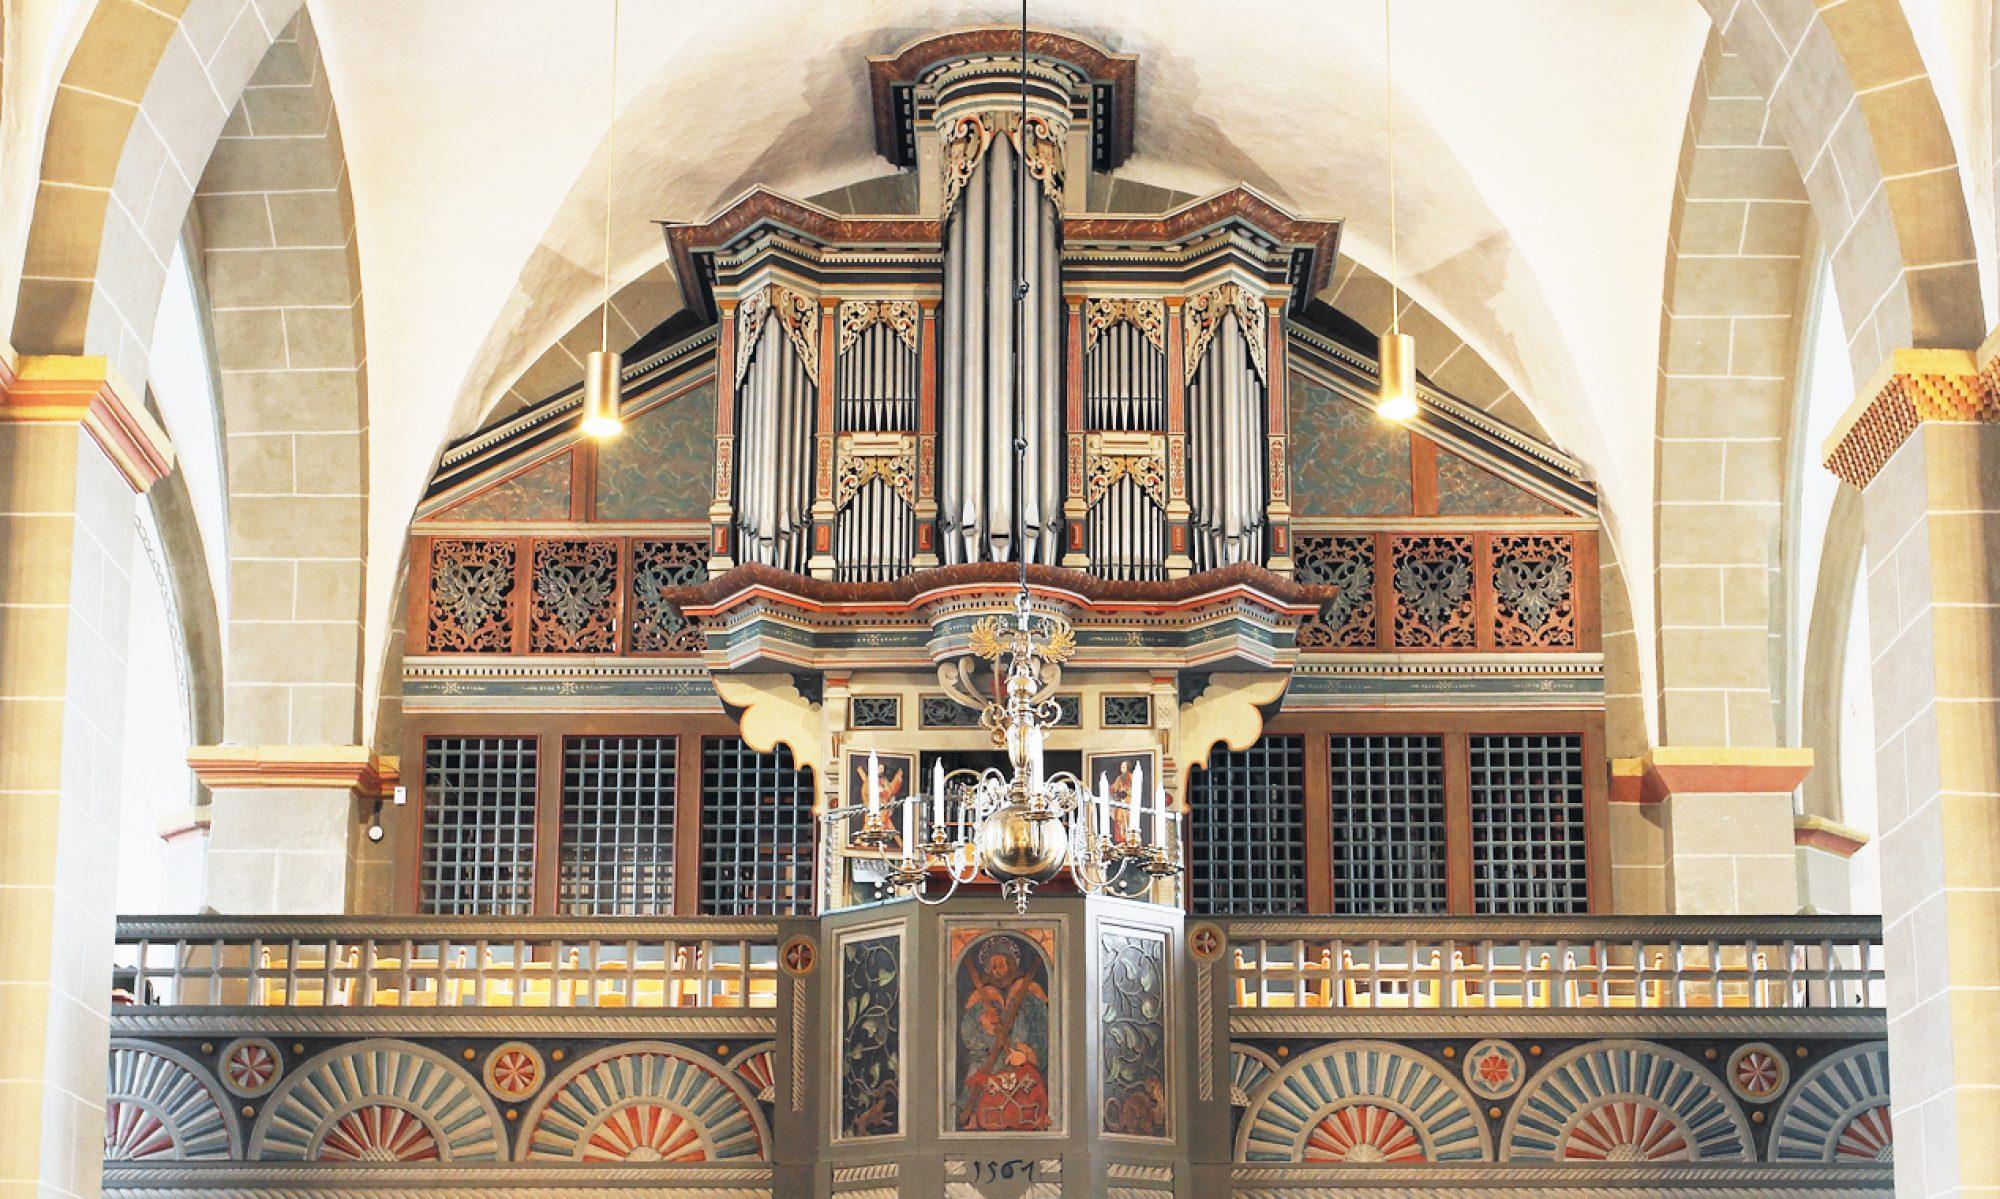 Kirch- und Orgelbauverein Lübbecke e.V.